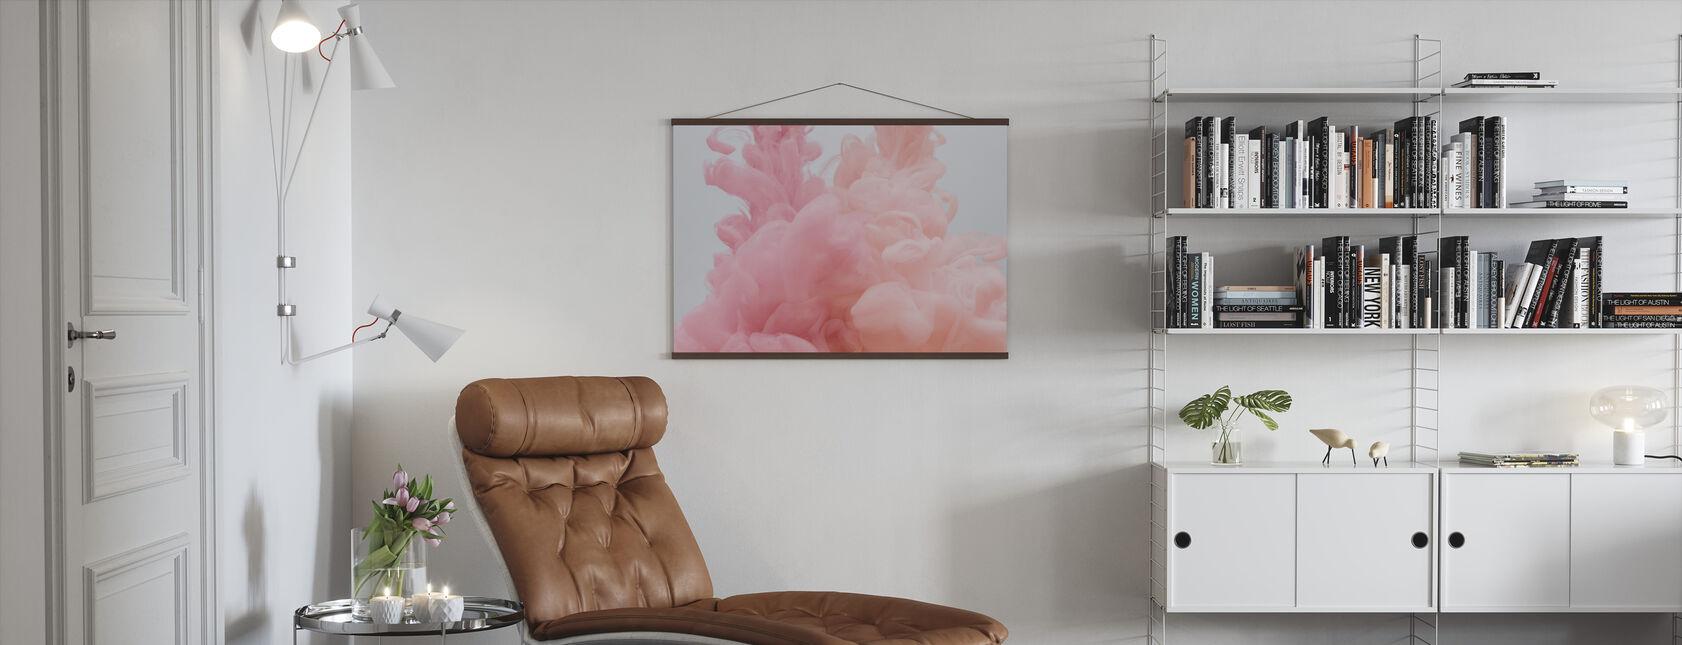 Peony Blossom - Poster - Living Room